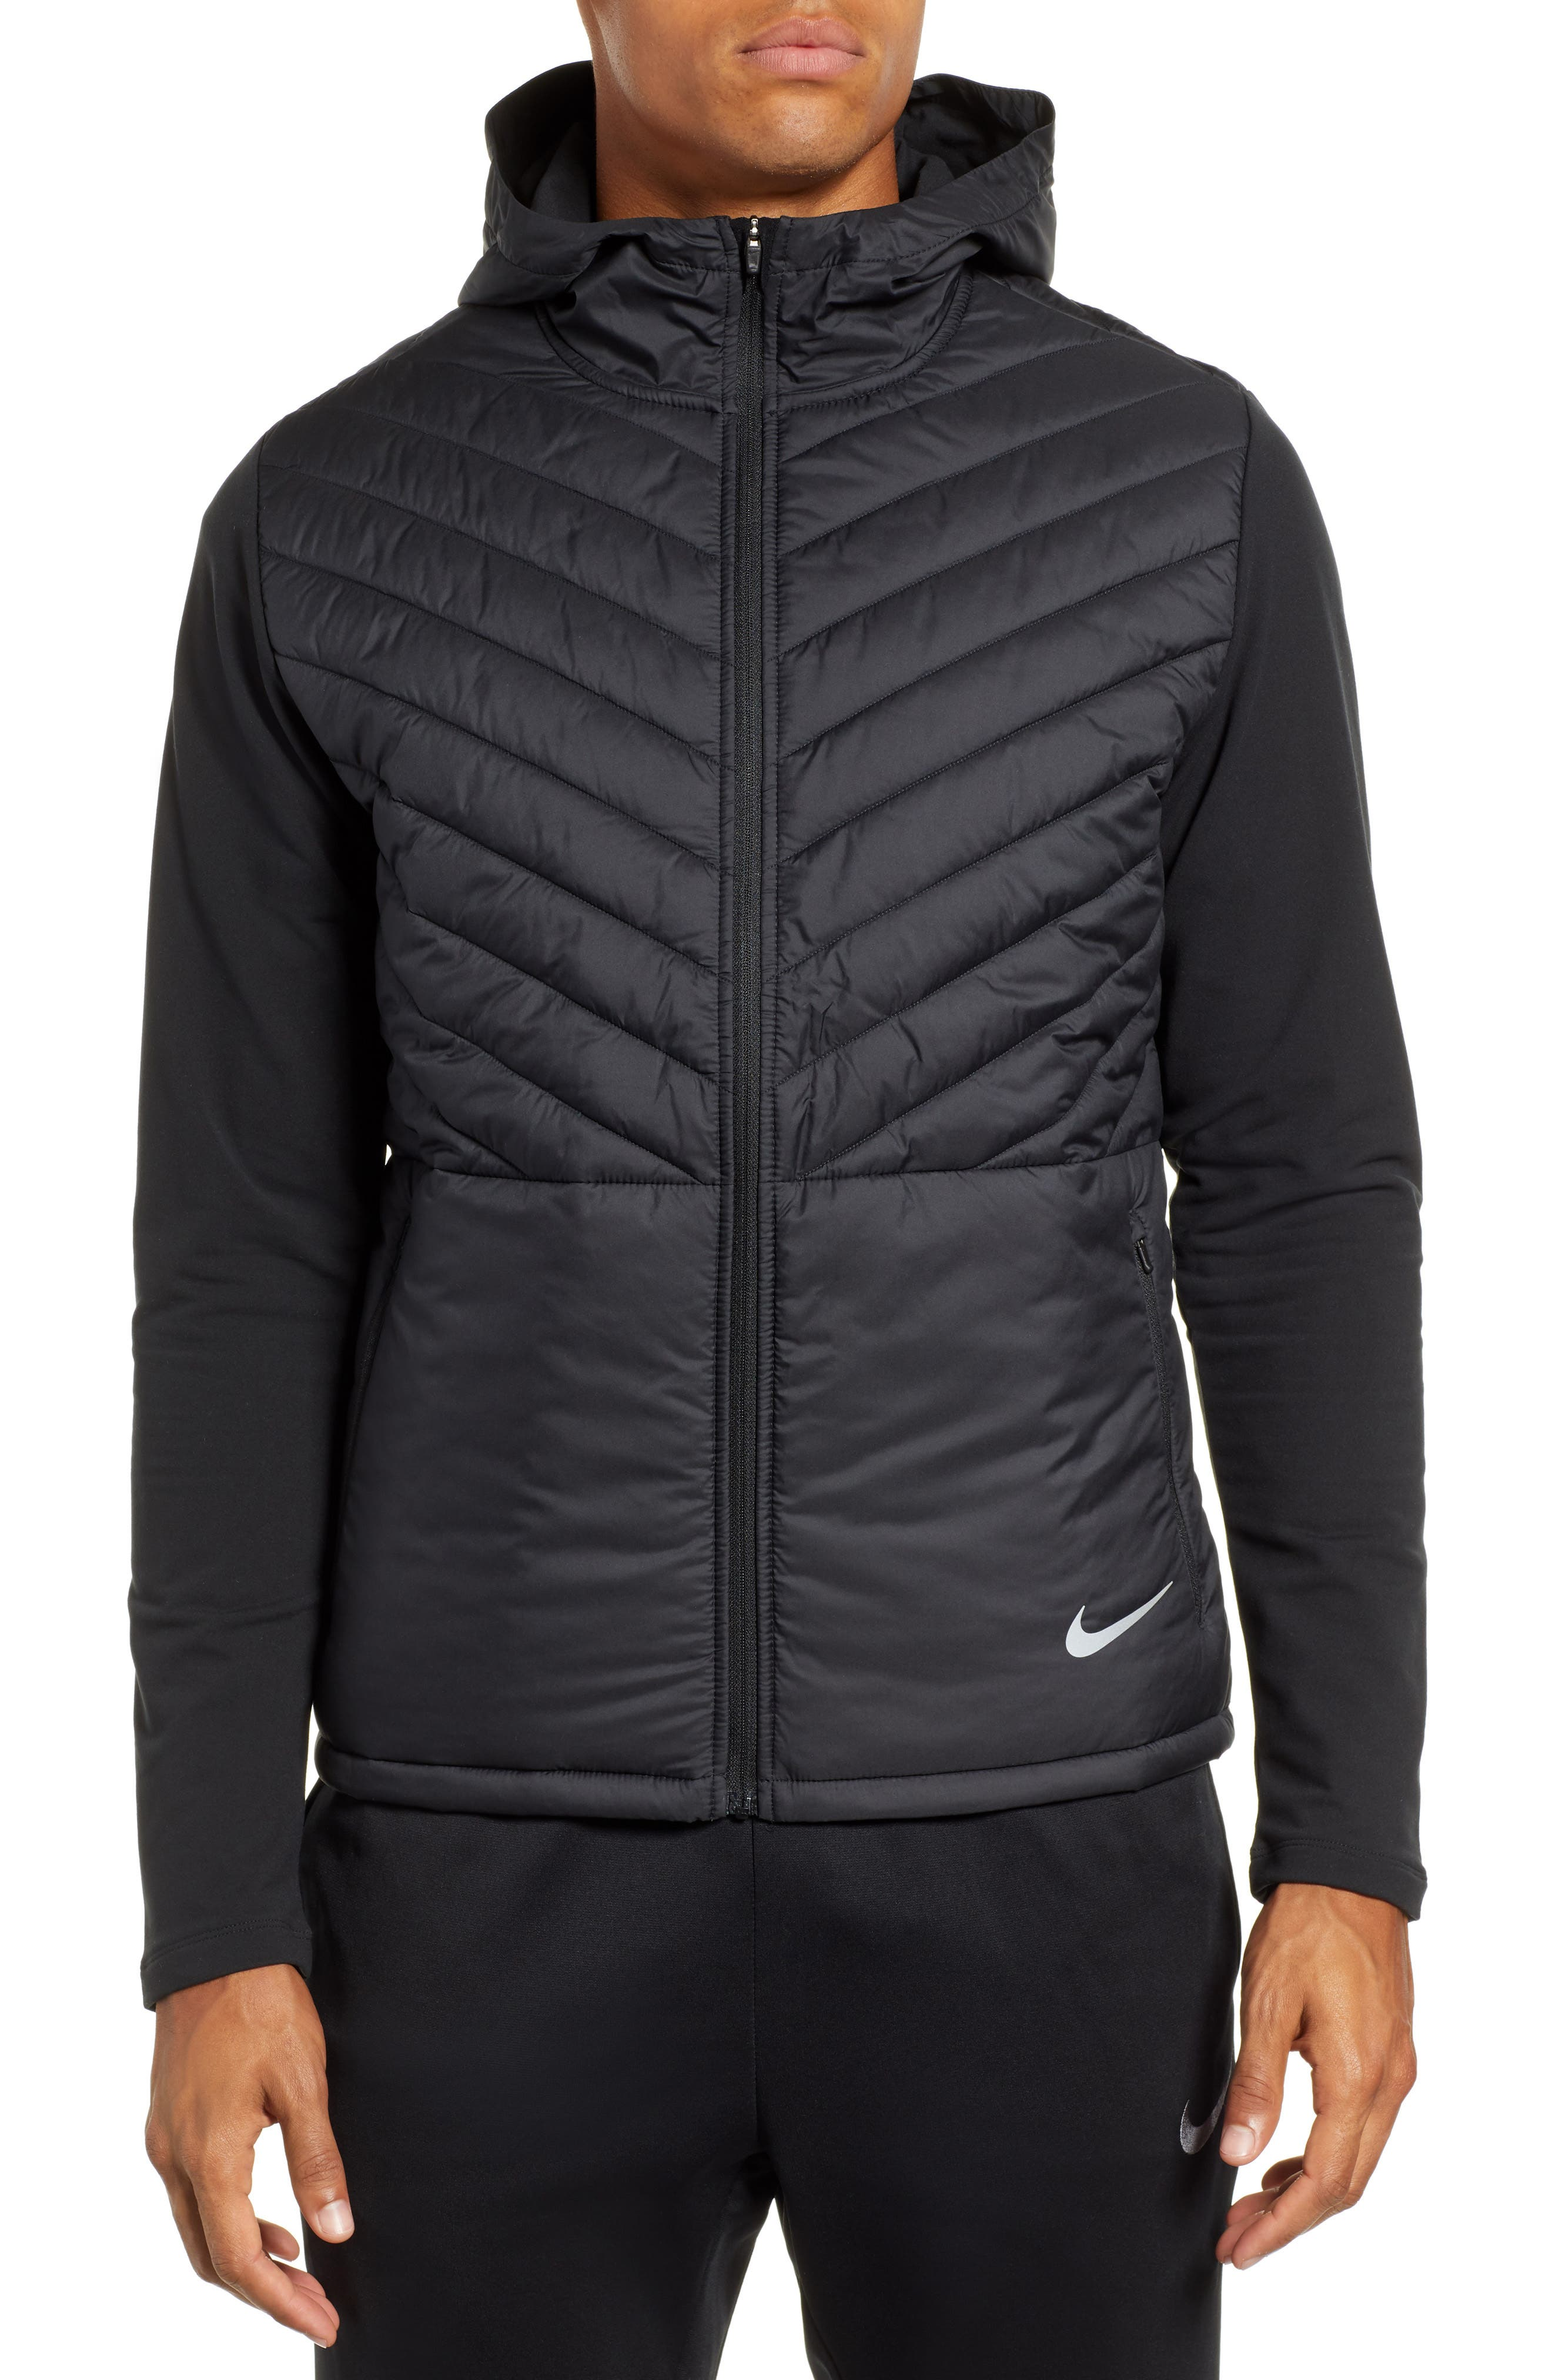 Nike AeroLayer Hooded Running Jacket